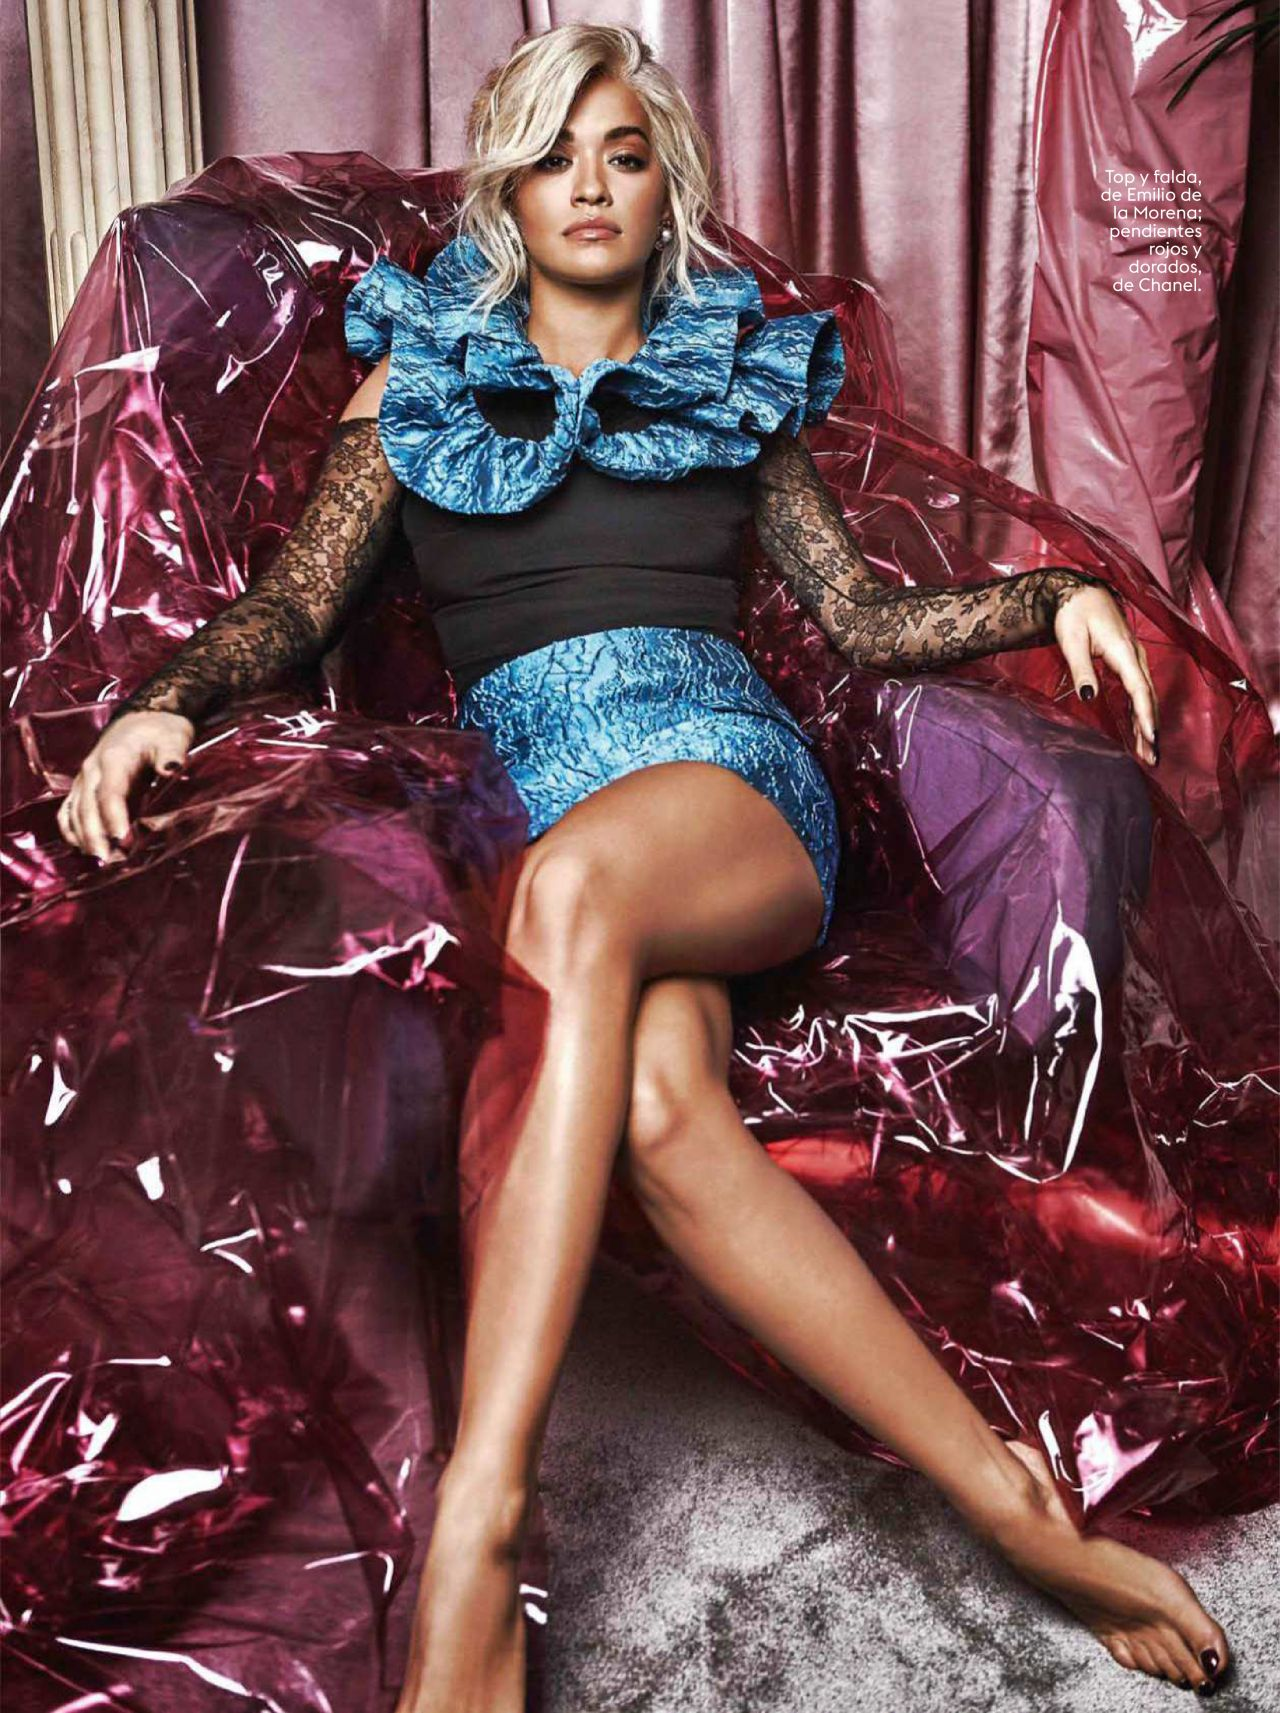 https://celebmafia.com/wp-content/uploads/2018/11/rita-ora-glamour-magazine-spain-11-2018-7.jpg